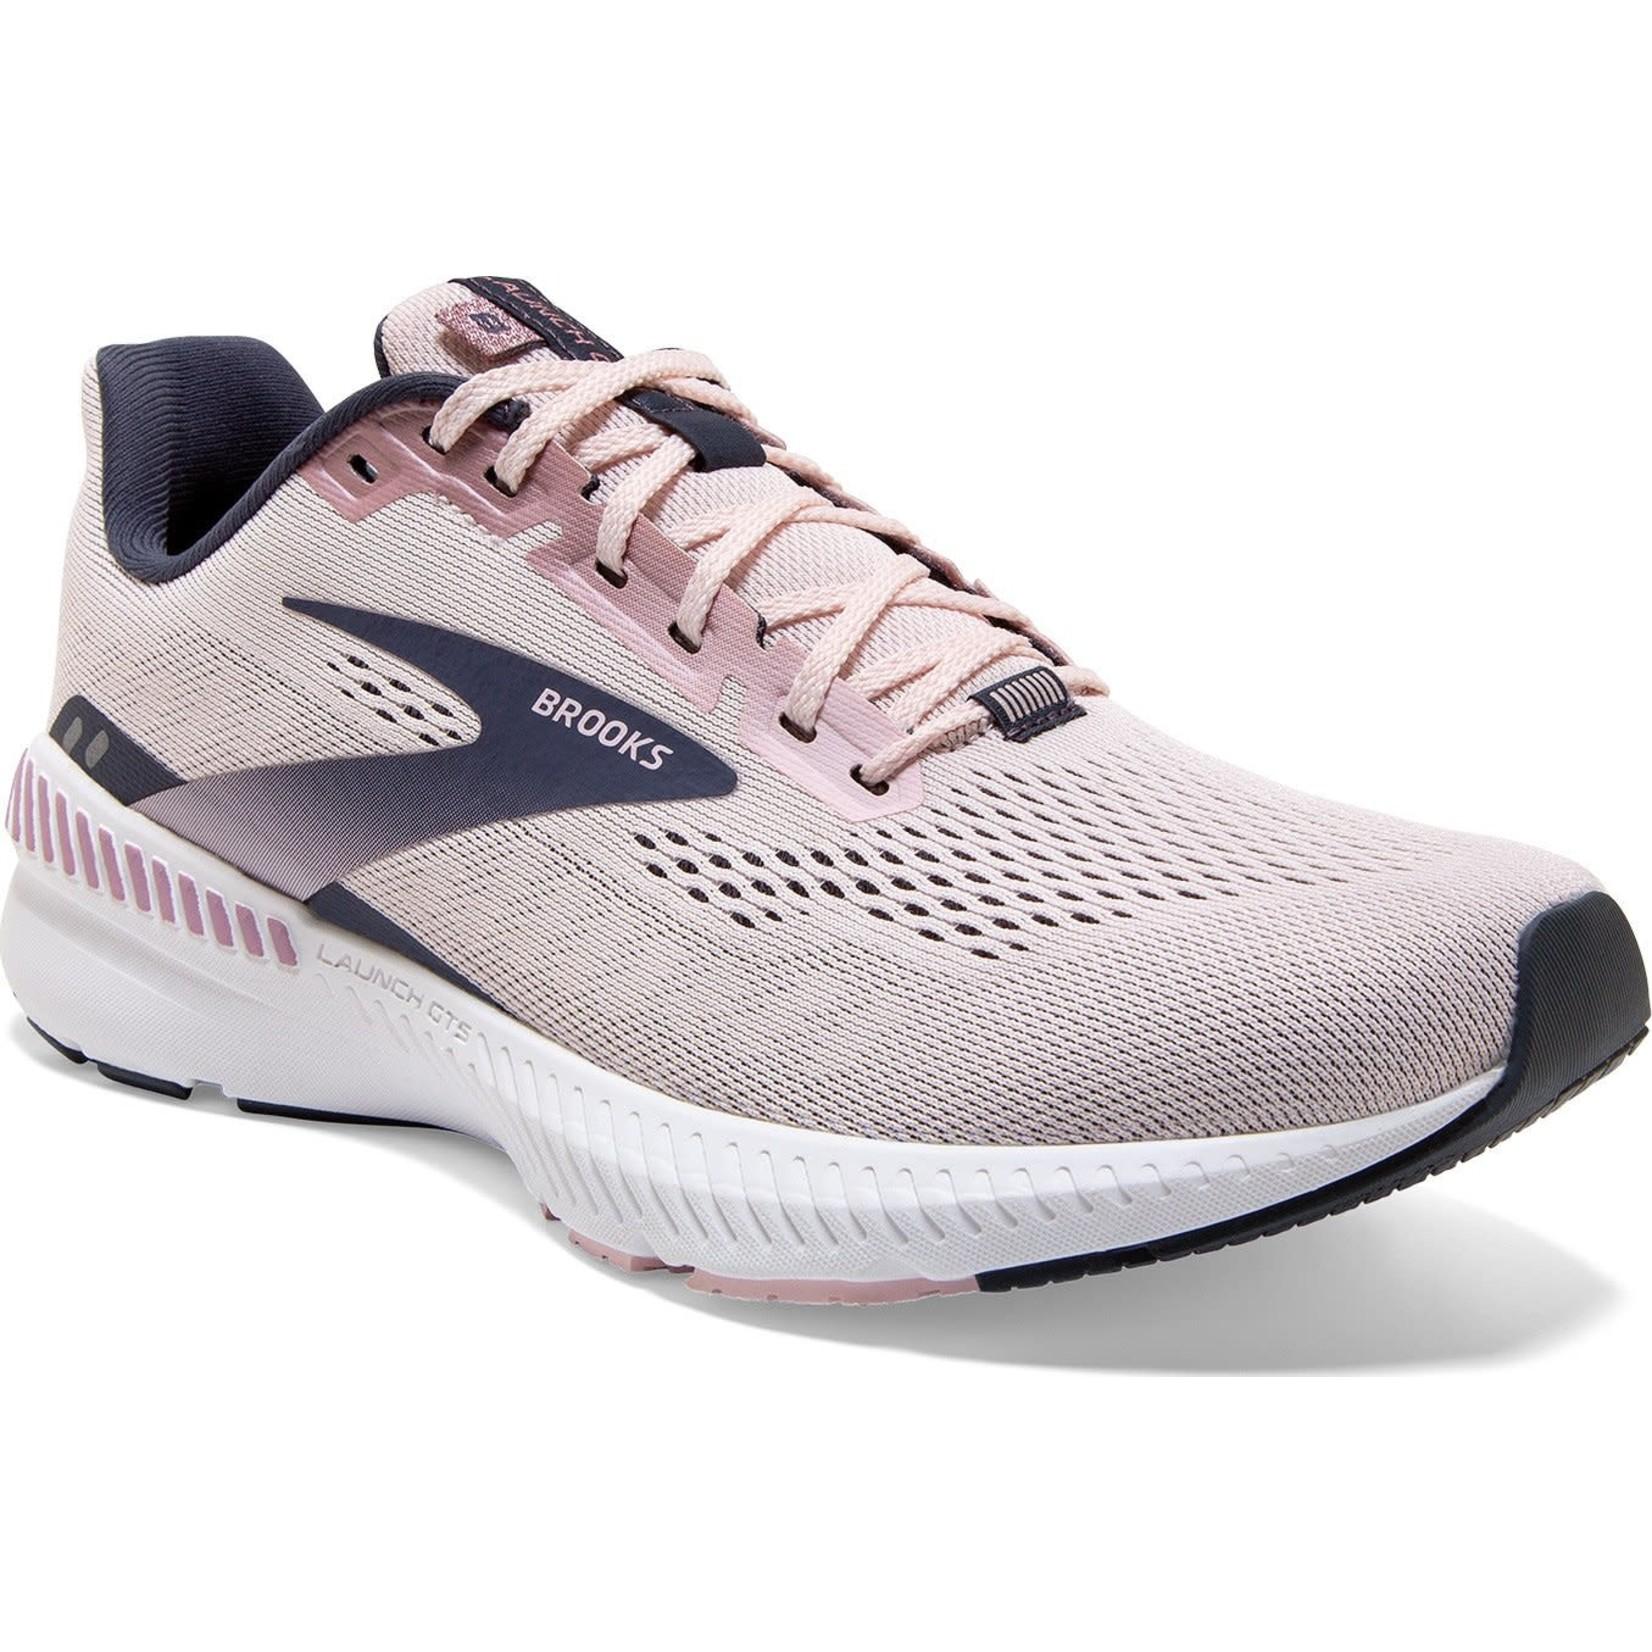 Brooks Brooks Running Shoes, Launch GTS 8, Ladies